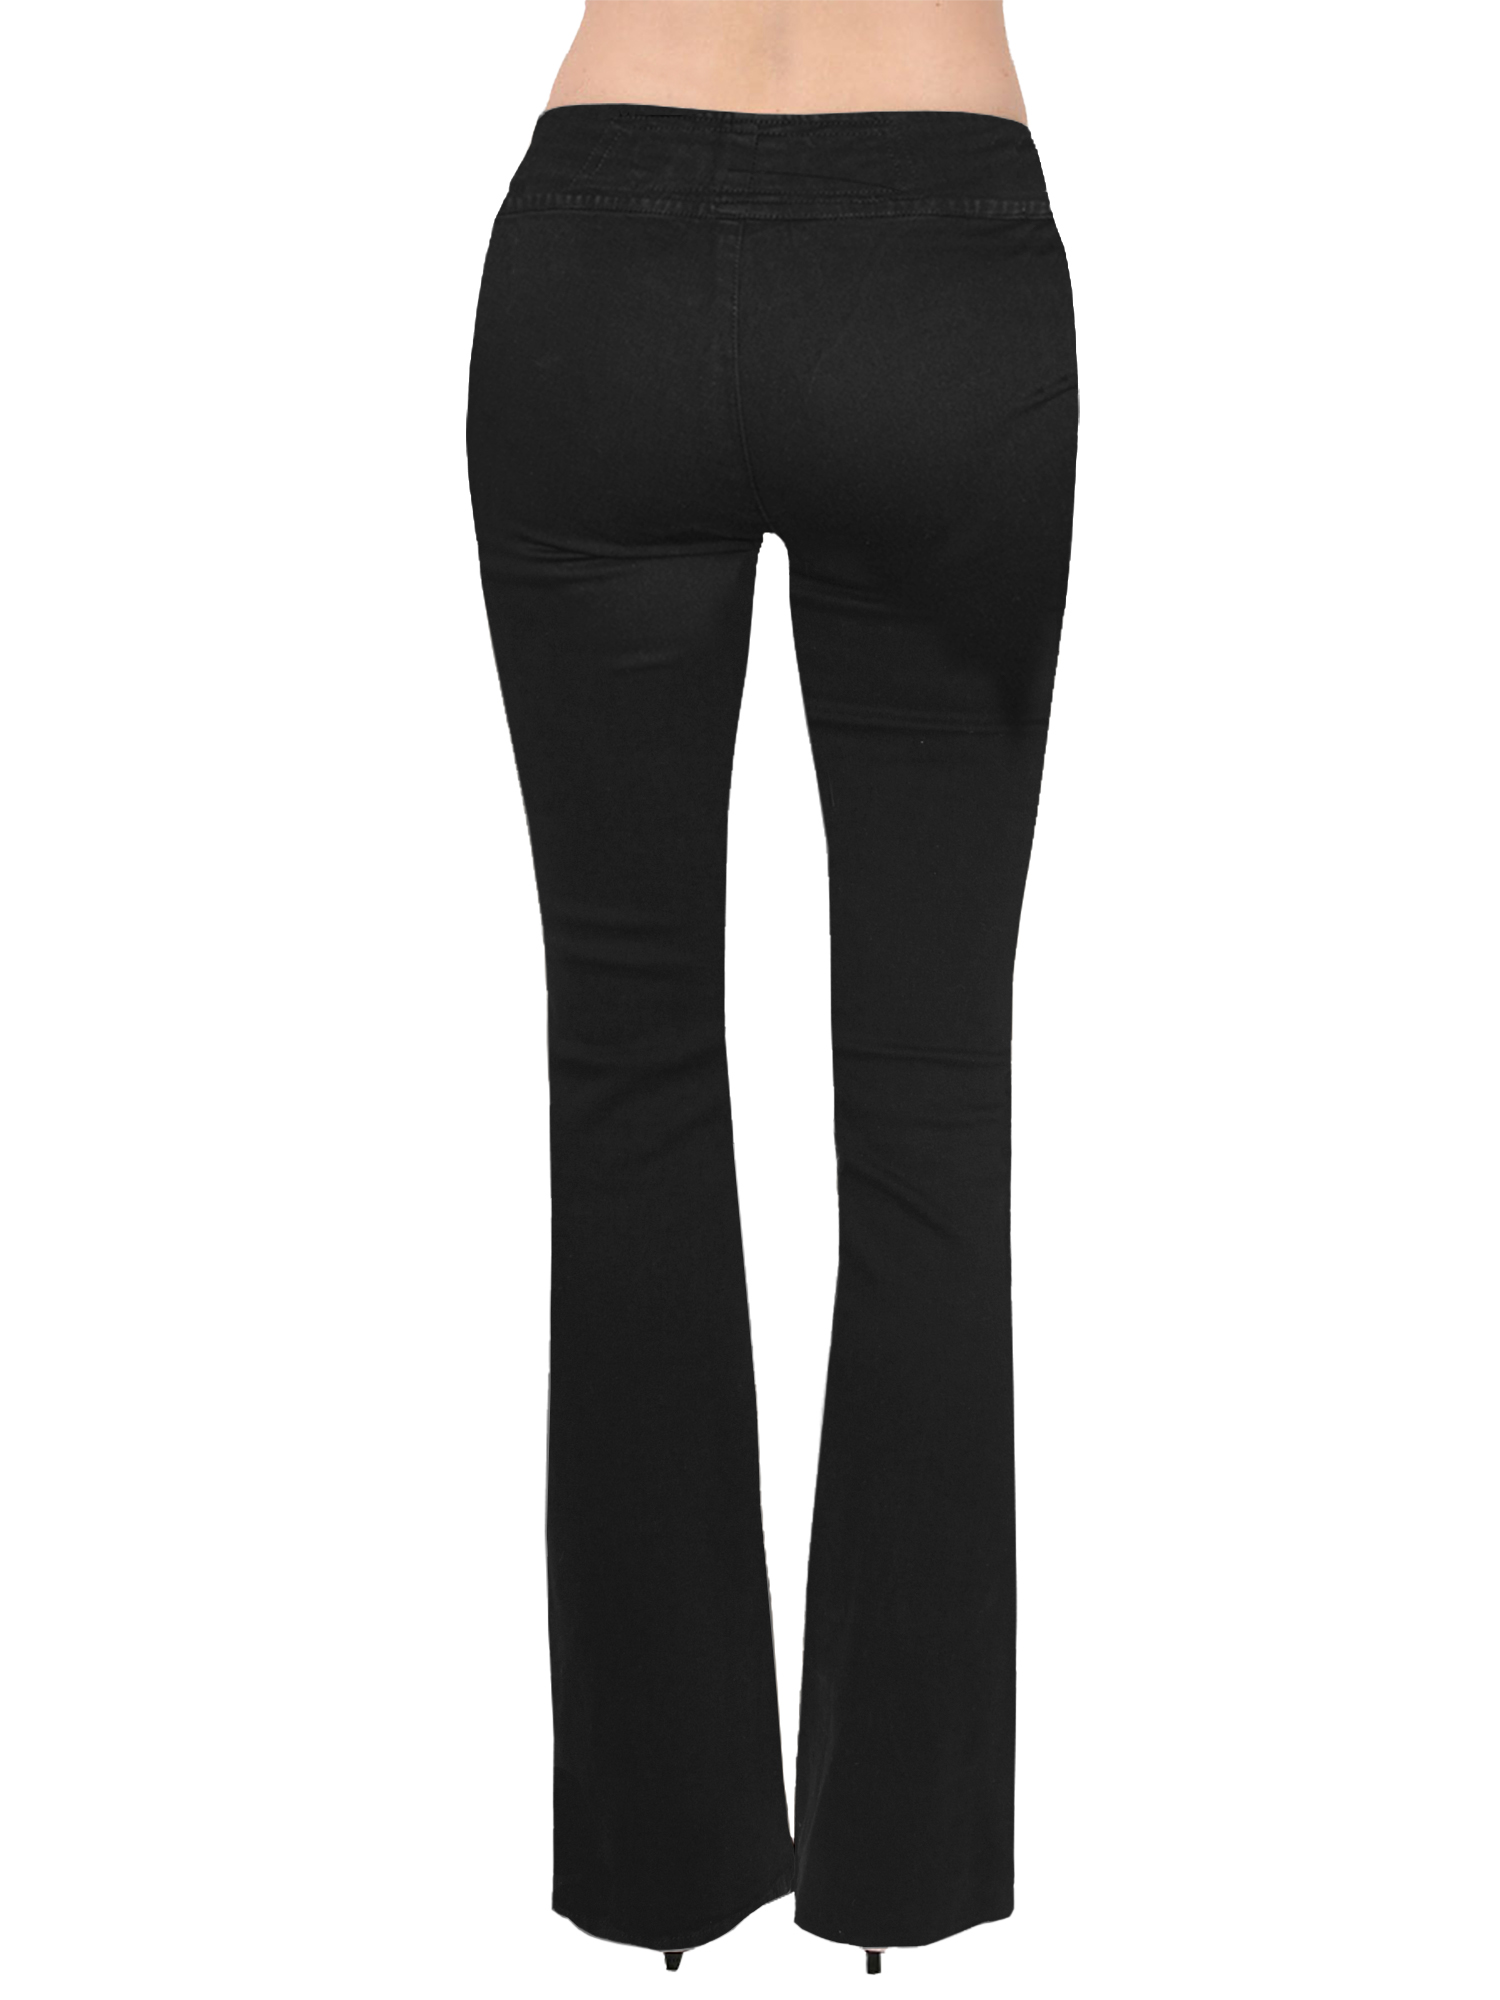 HyBrid /& Company Womens Slim Boot Cut Stretch Pants